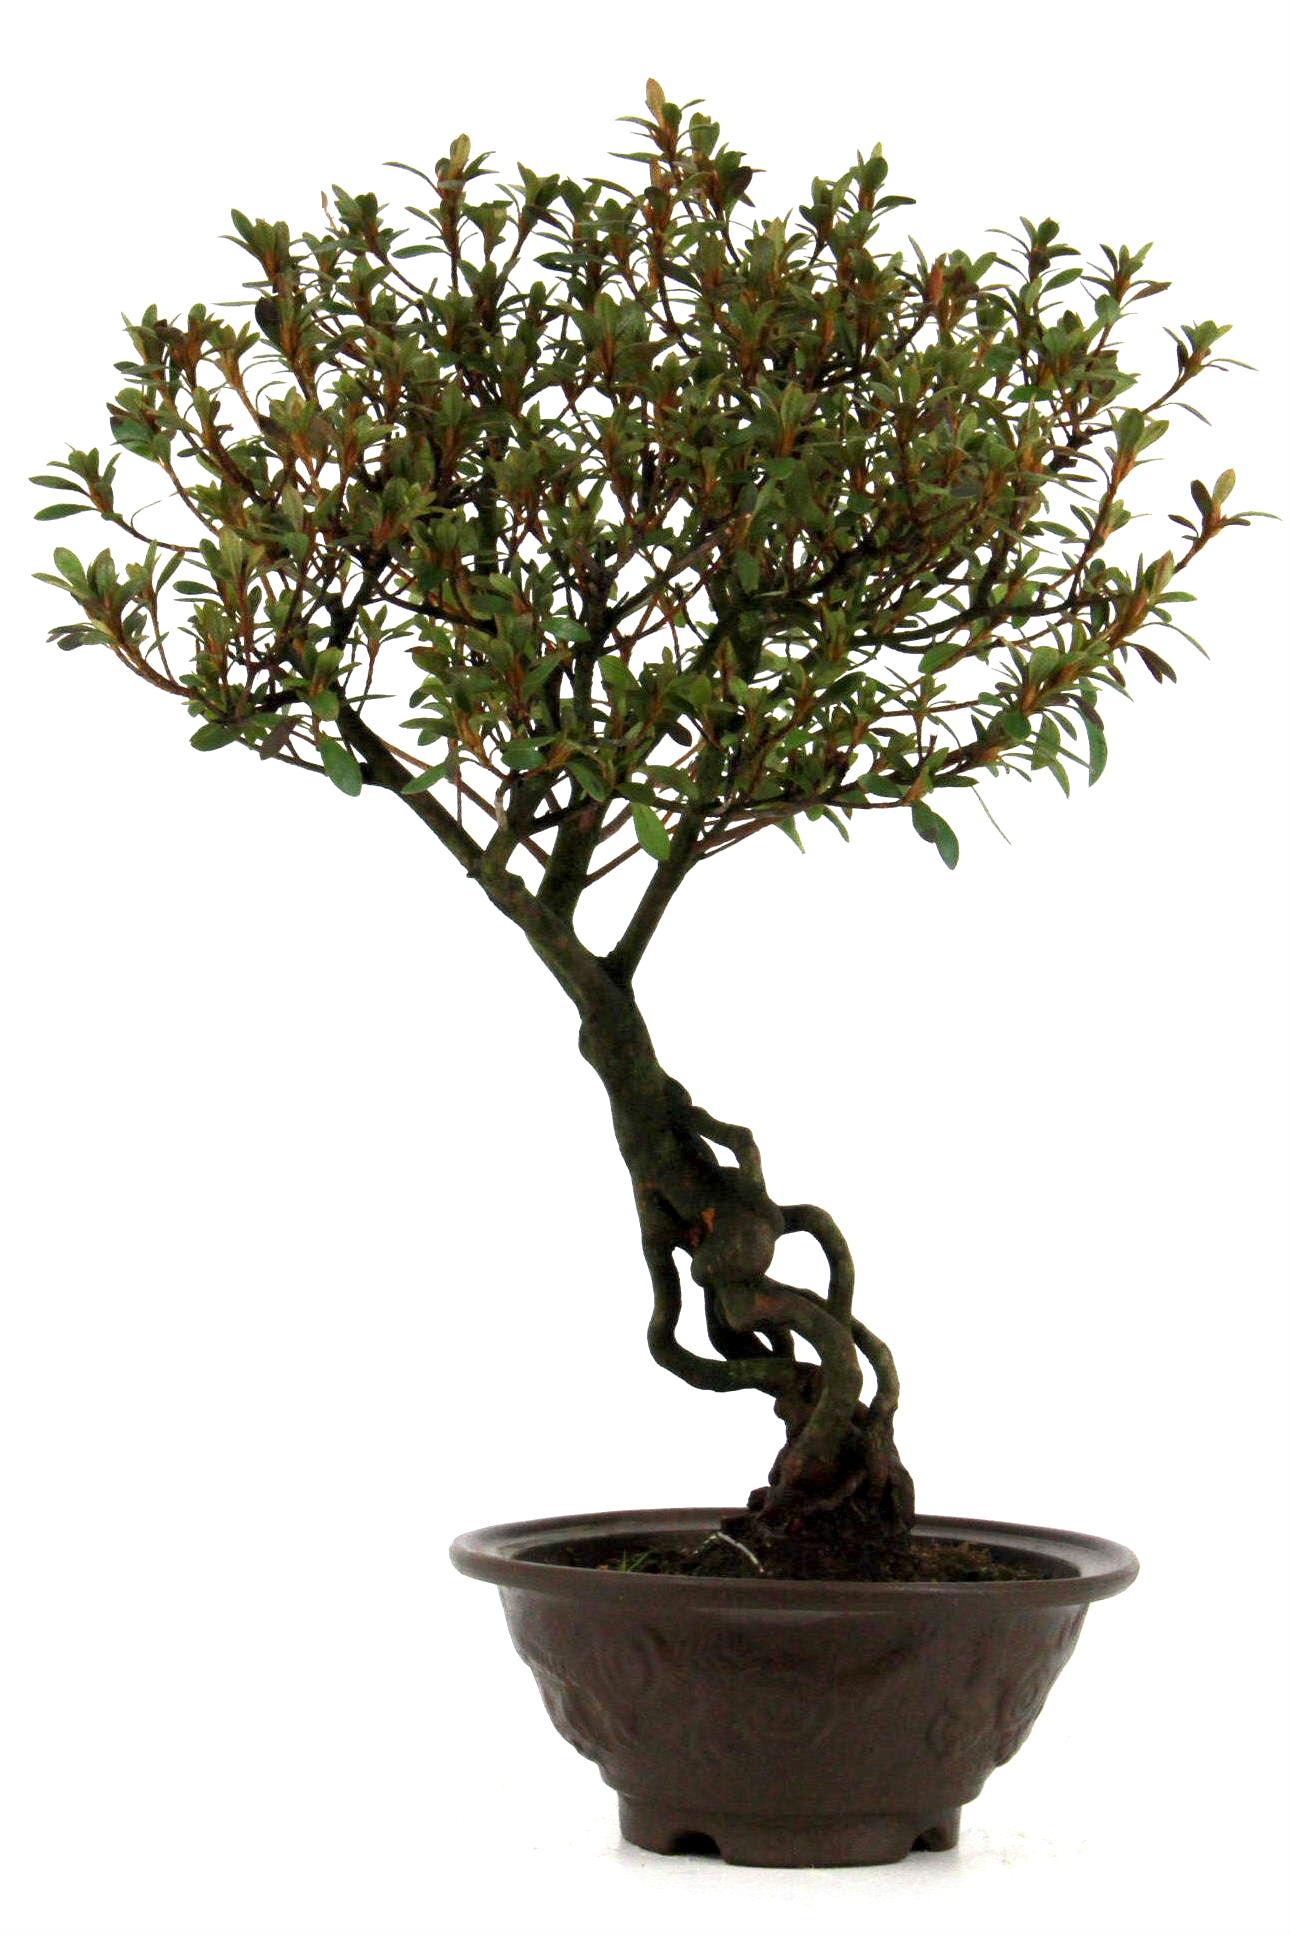 azaleen bersicht onlineshop oyaki bonsai. Black Bedroom Furniture Sets. Home Design Ideas